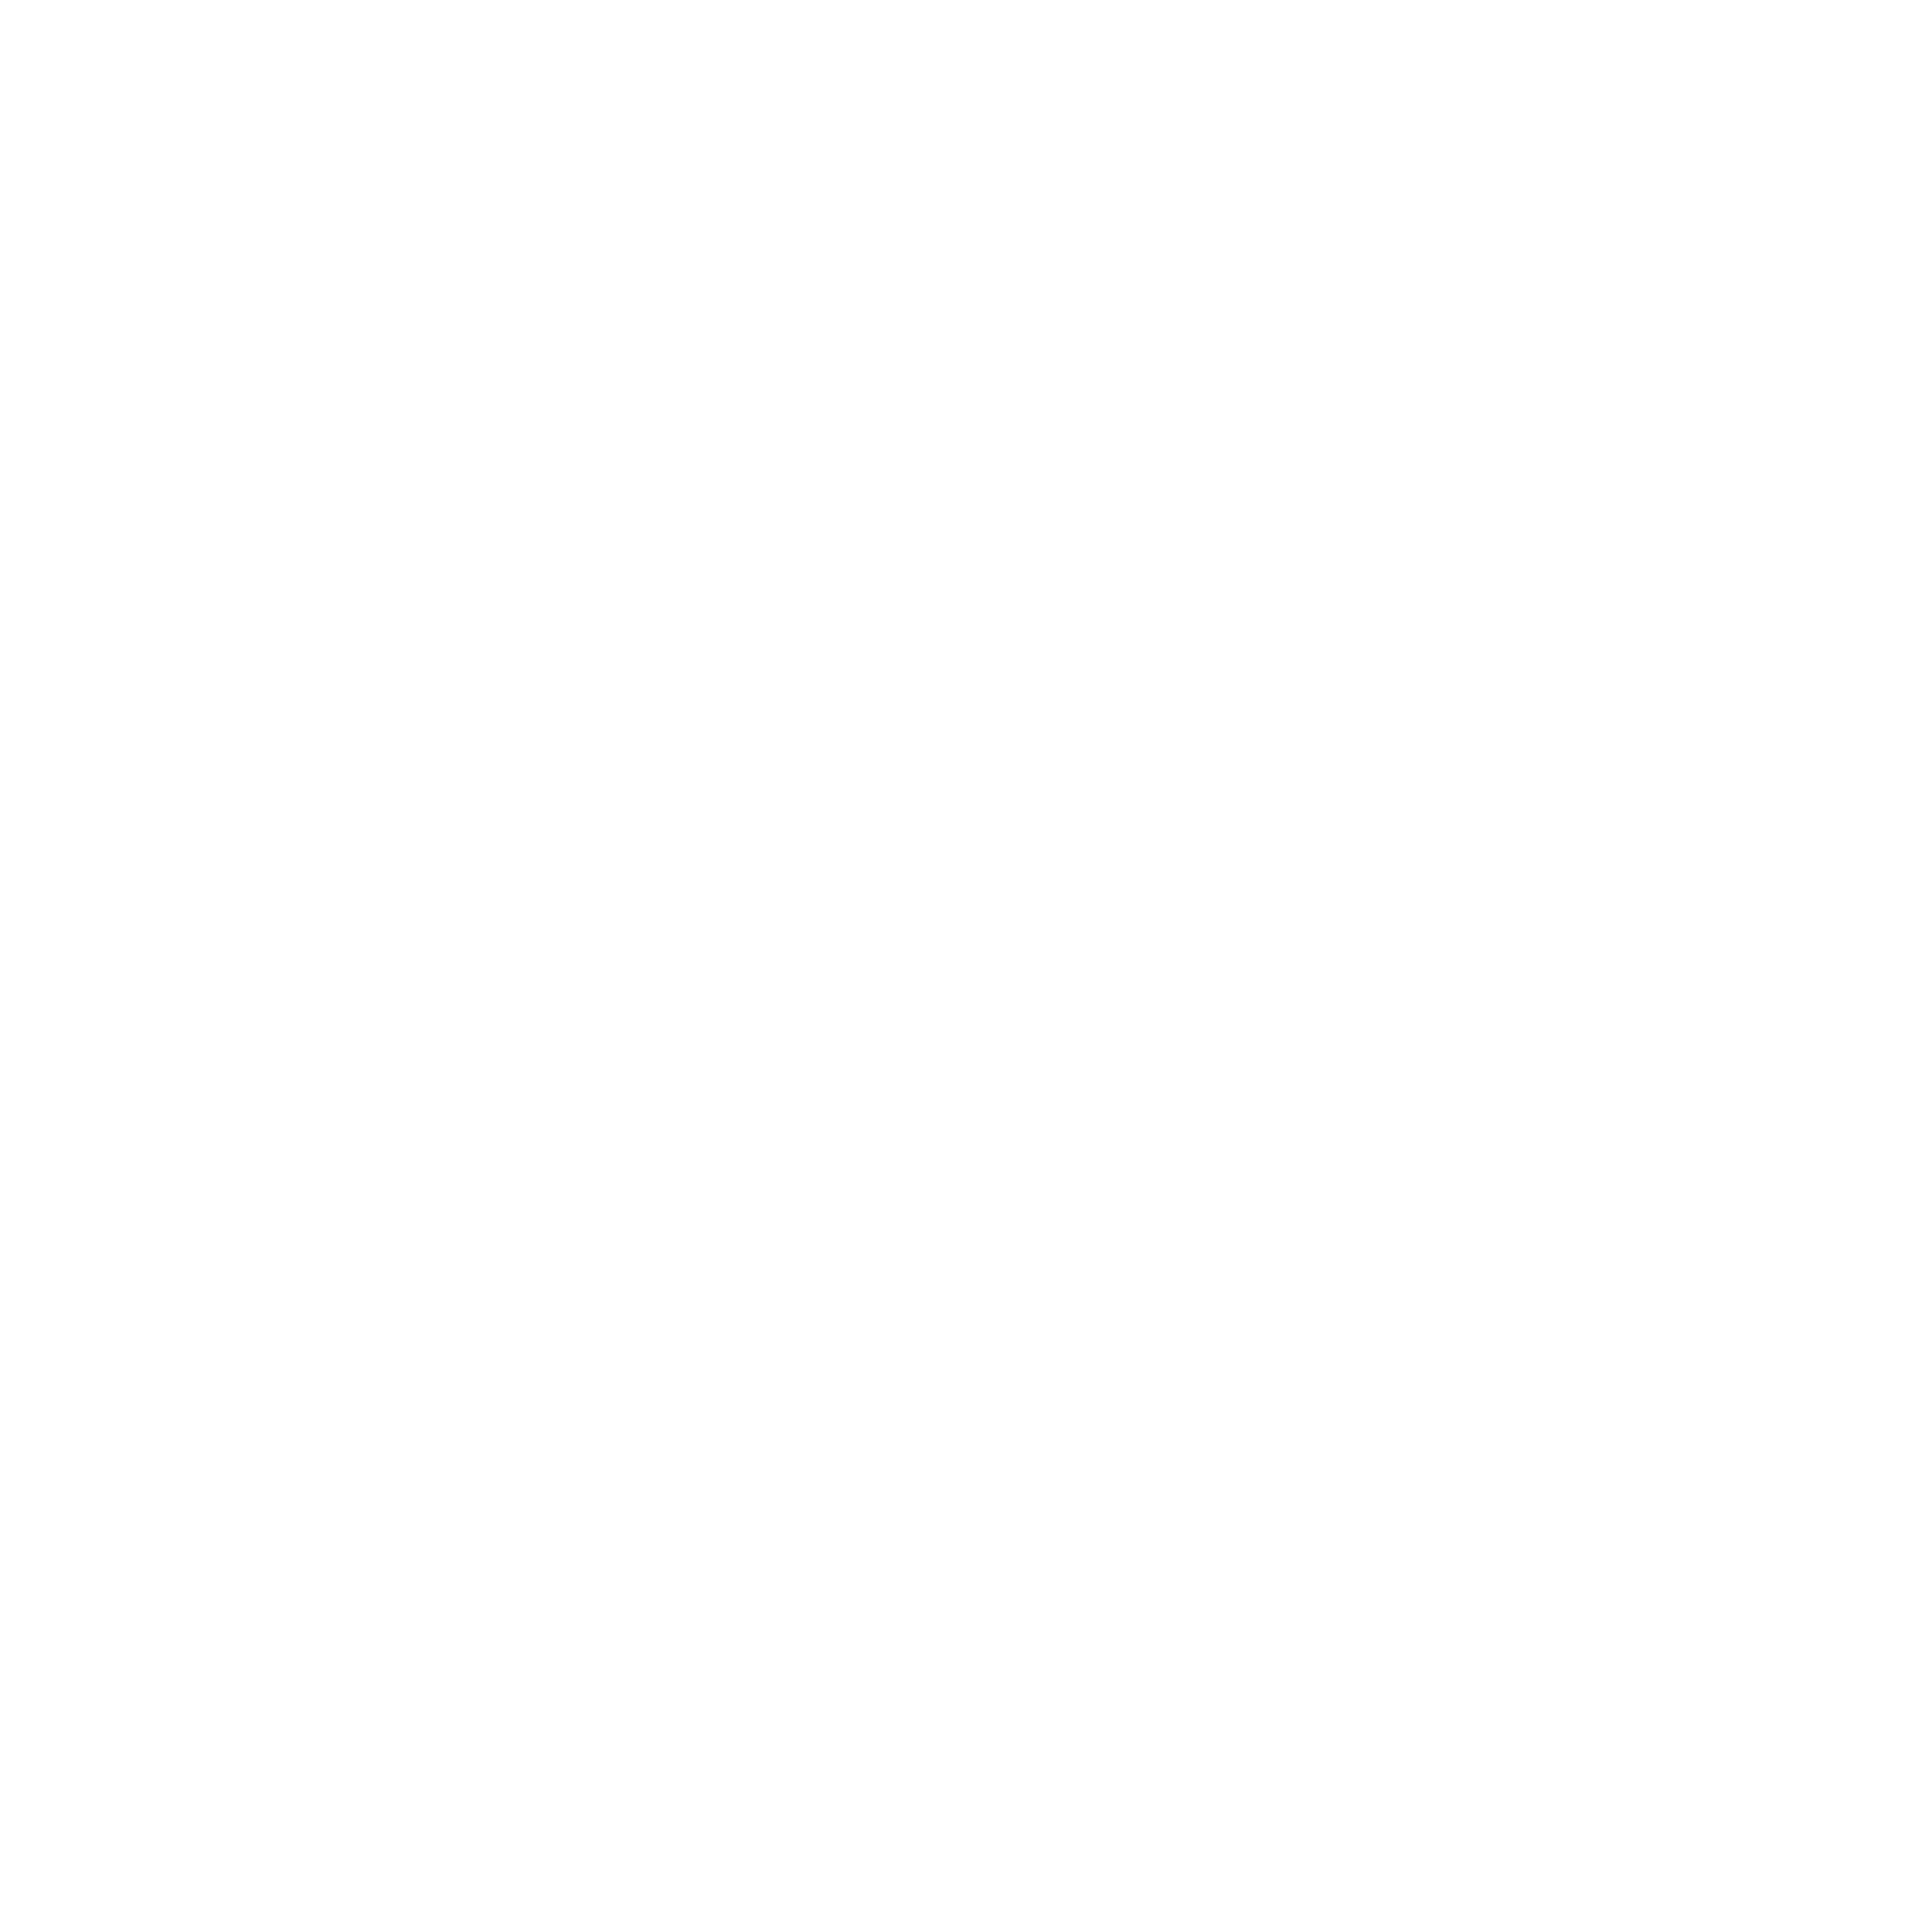 SEVENP LinkedIn